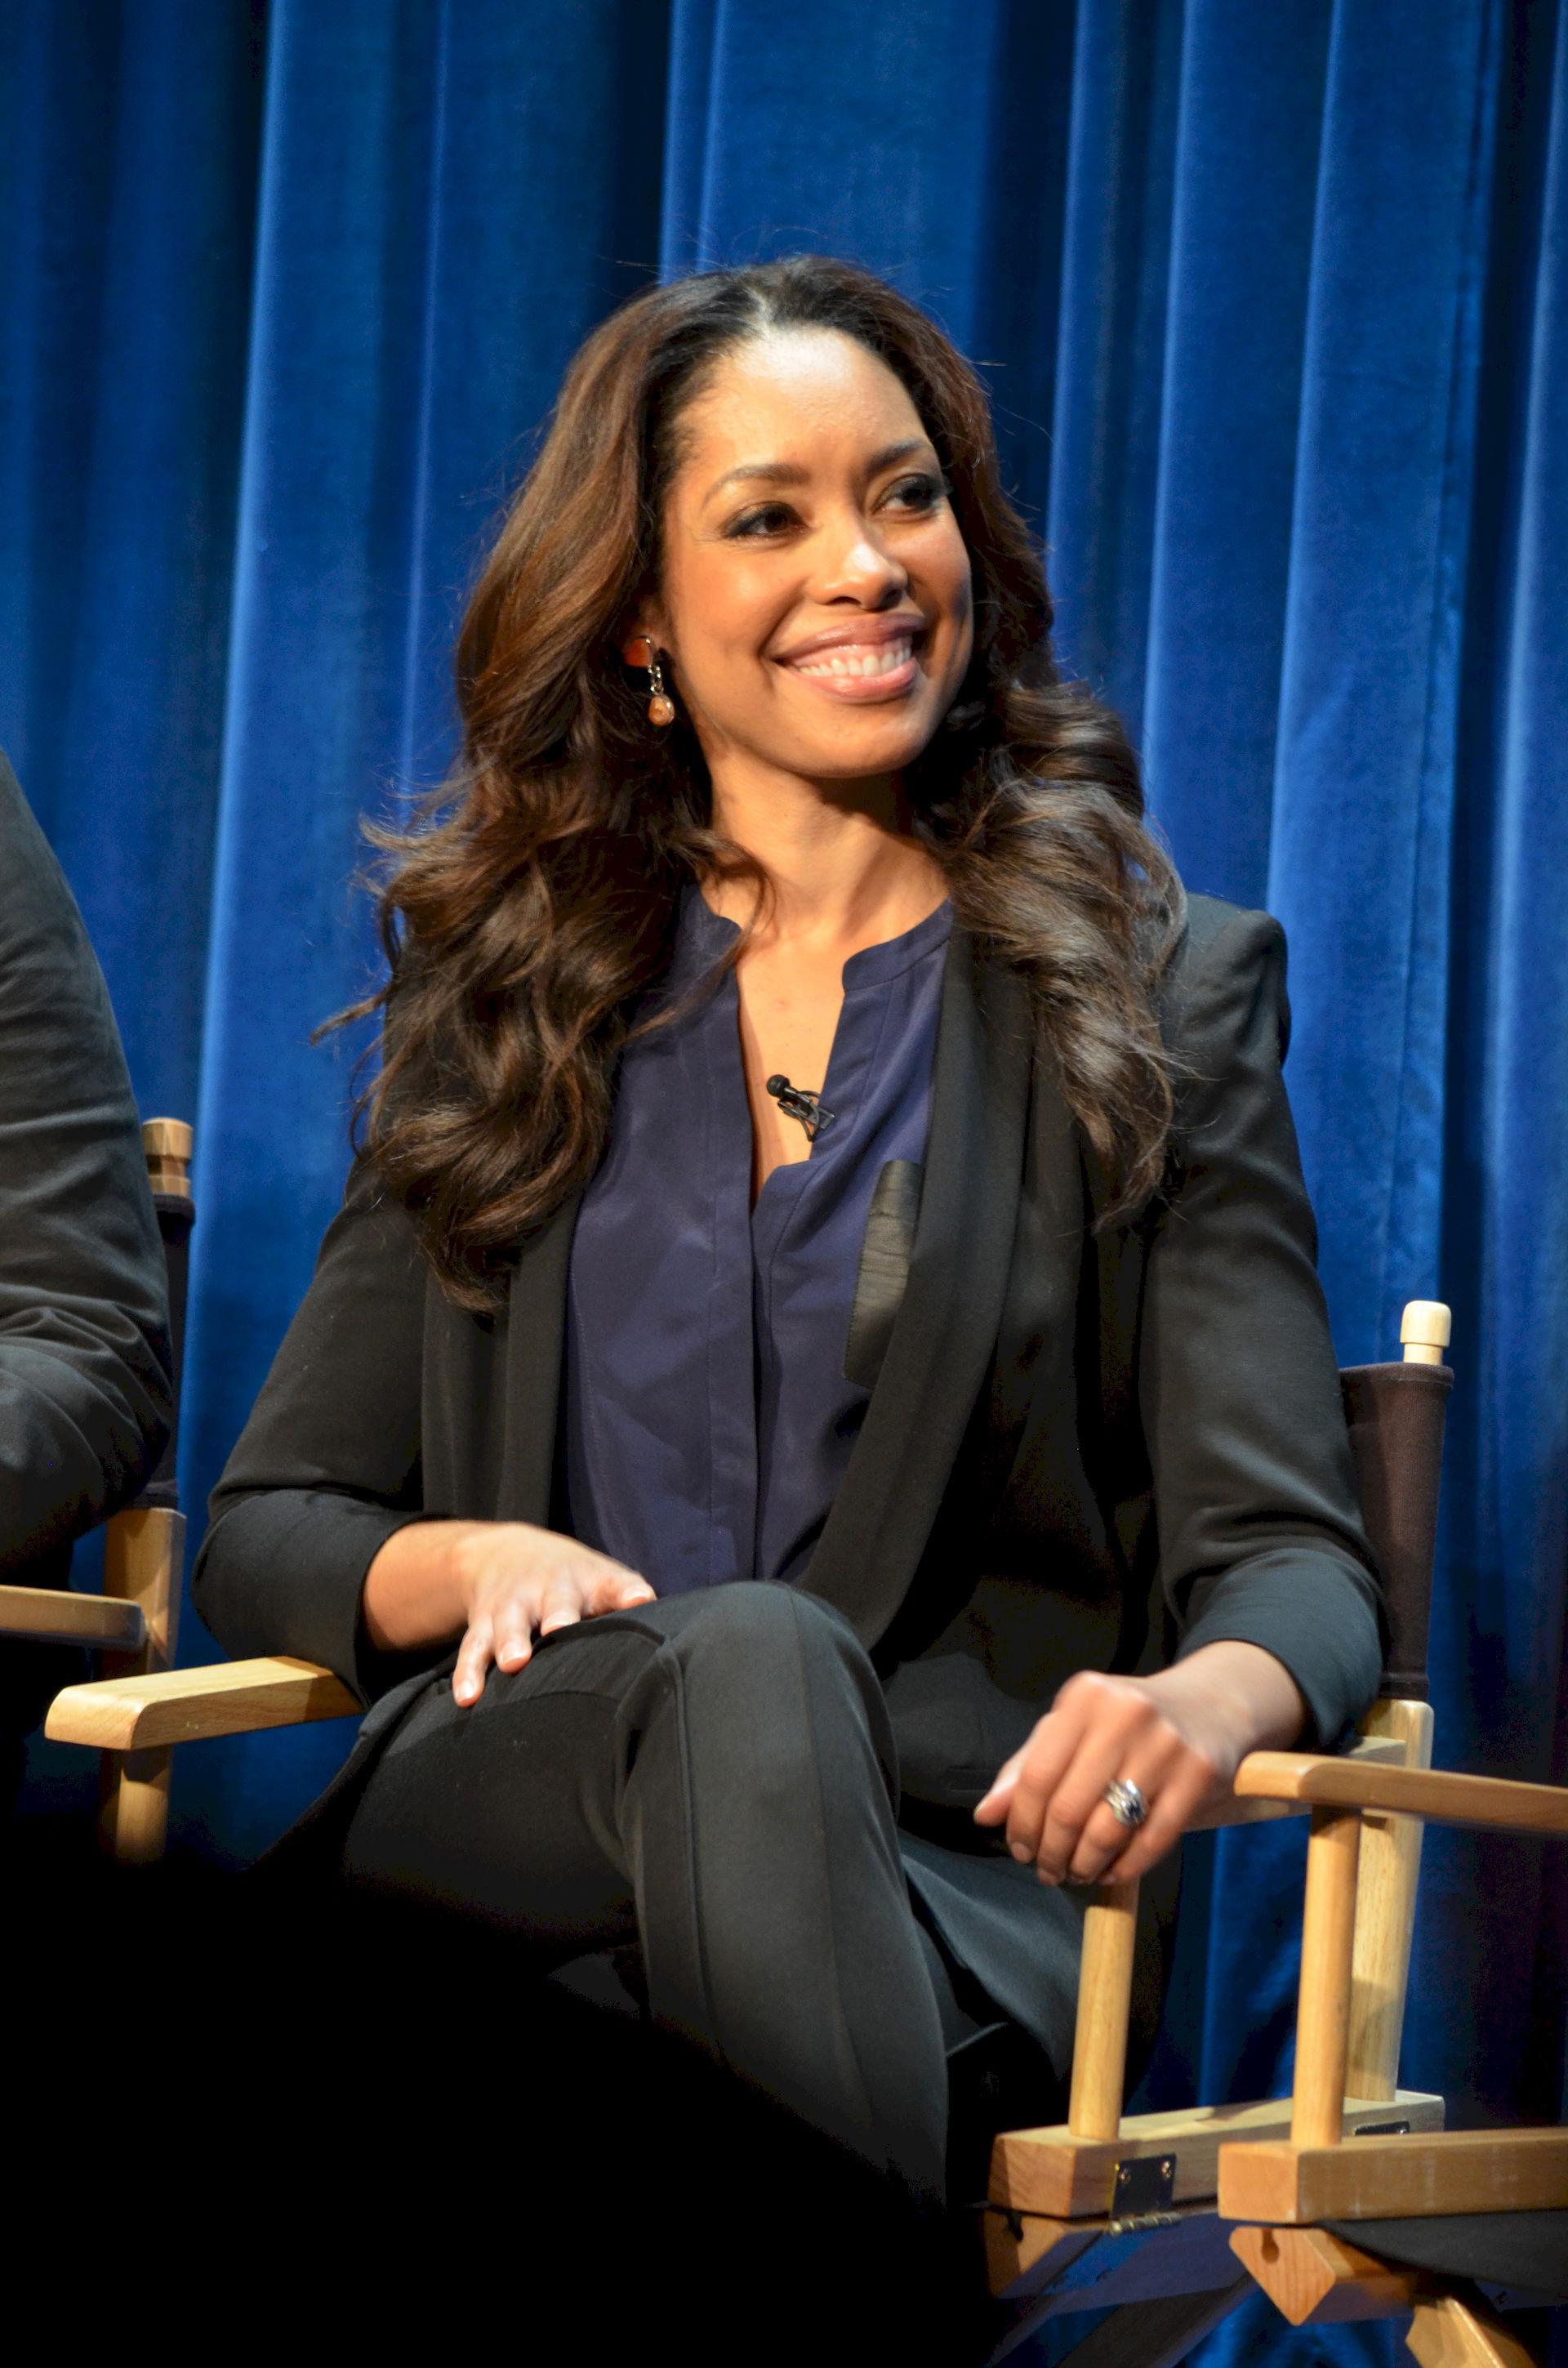 Photo of Gina Torres: American actress